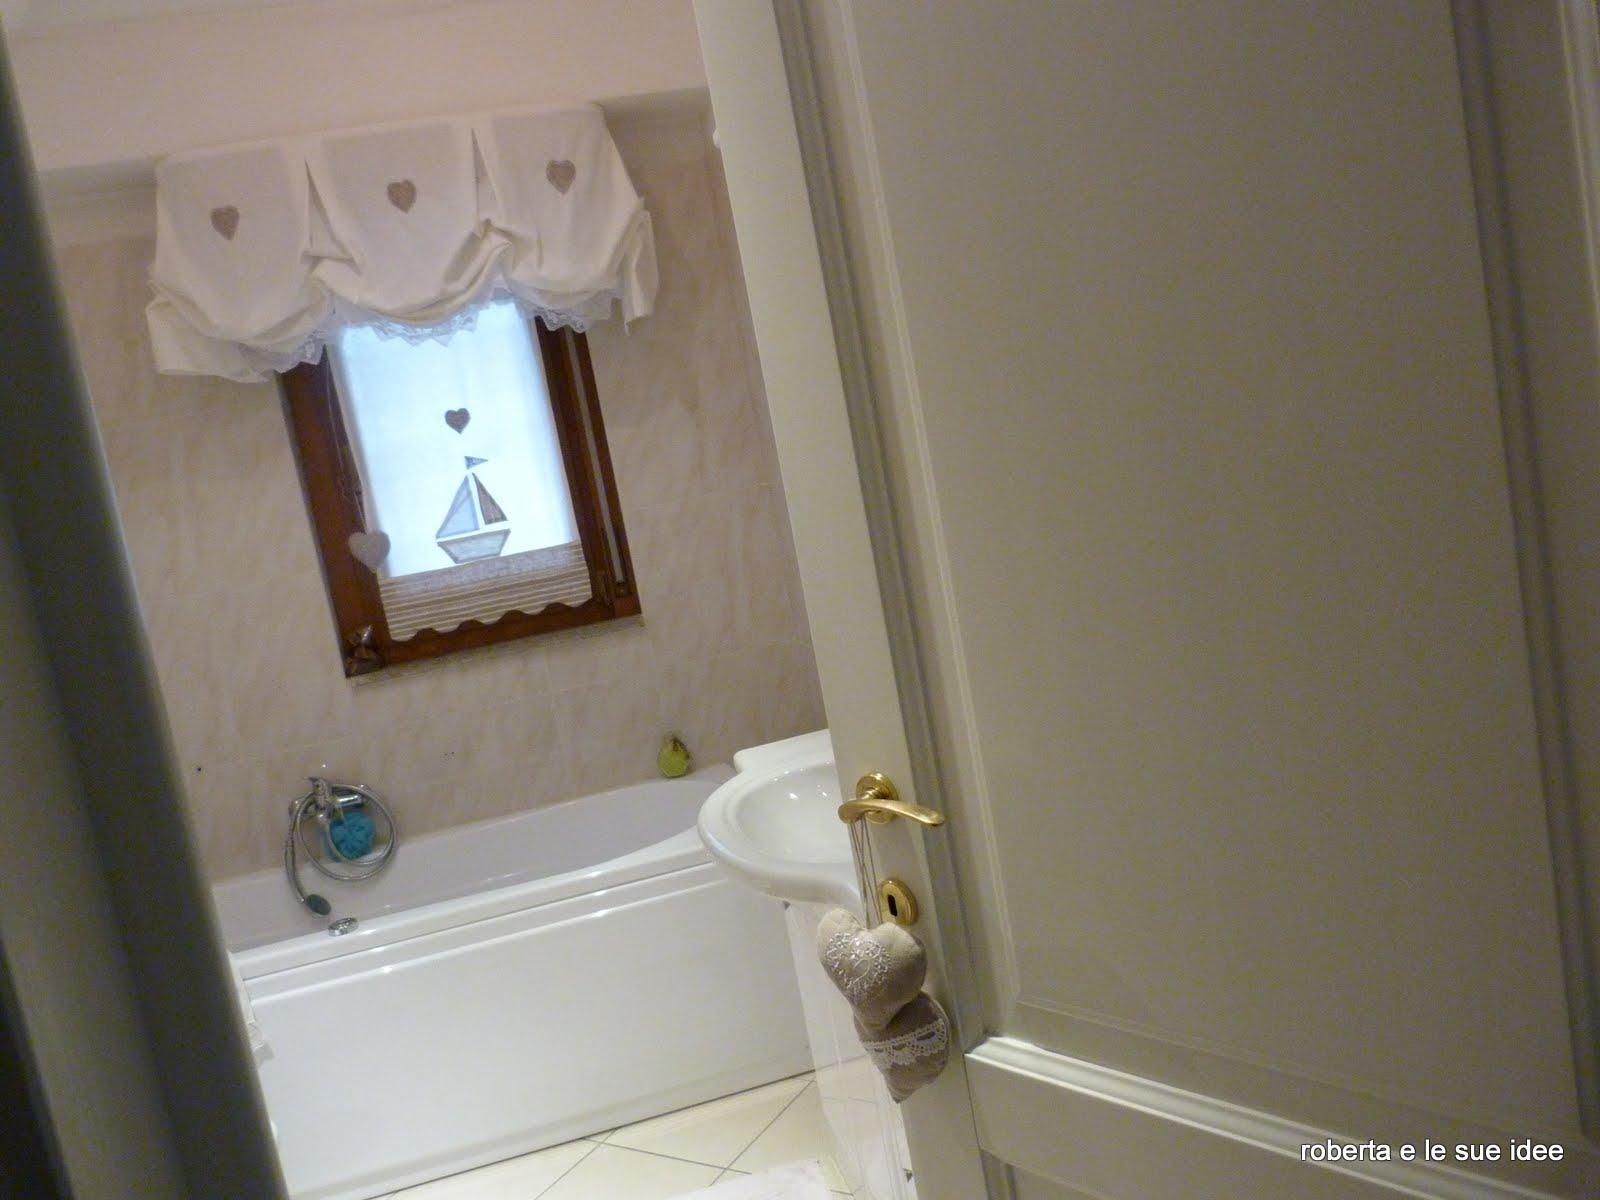 Tende da bagno ricamate finest home maison tende ricamate per con